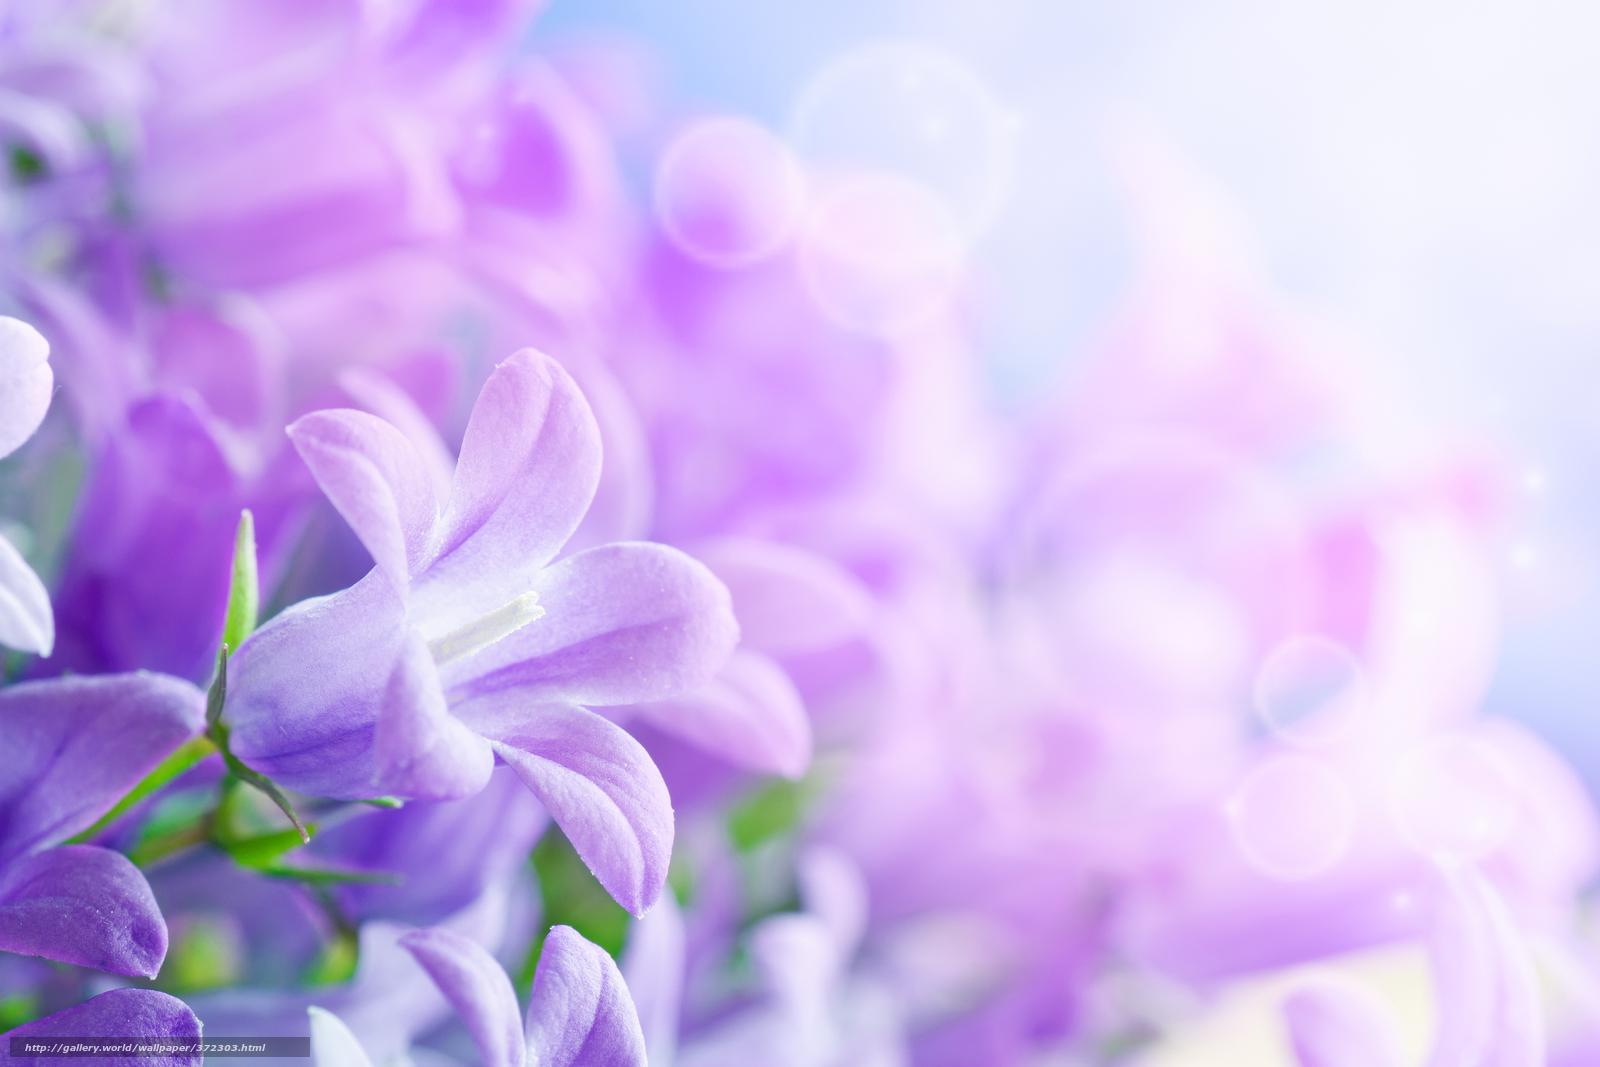 Скачать обои цветы, красивые, лепестки ...: ru.gdefon.com/download/cvety_krasivye_lepestki_listki_vsemirnyj...